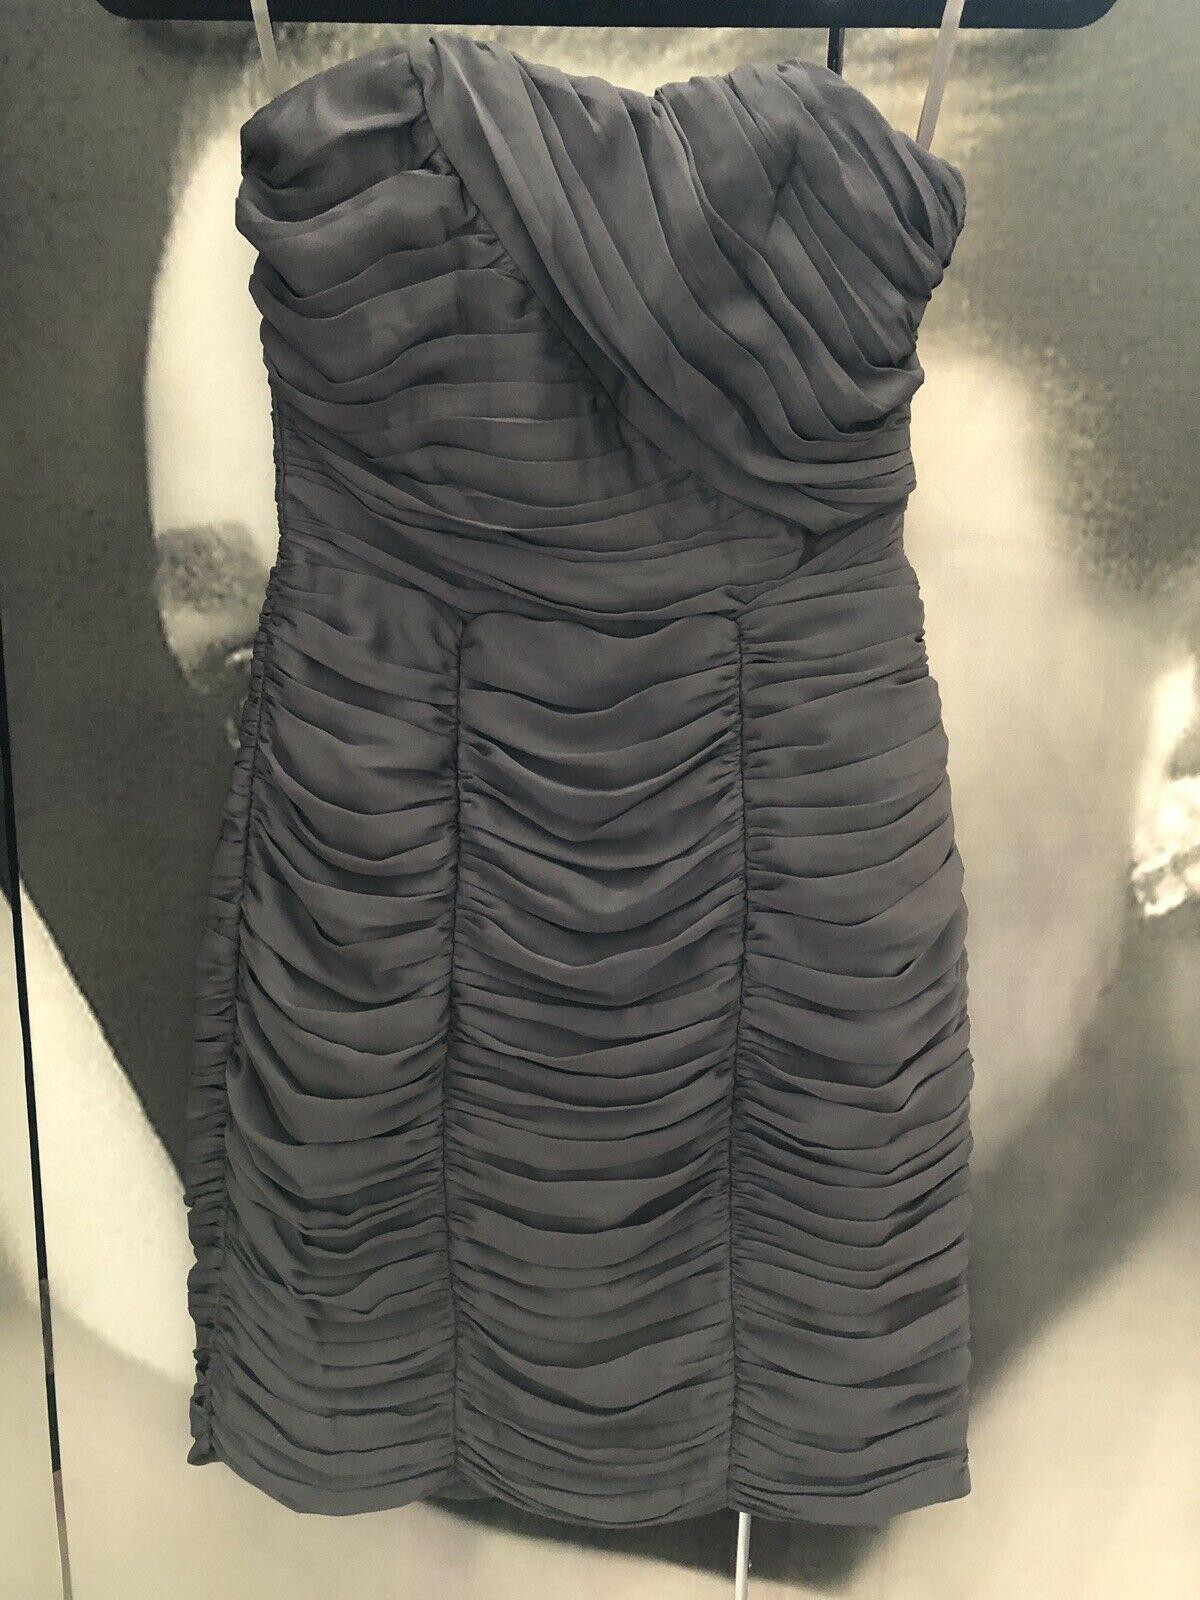 Designer Perfekt Kleid 34 Spezialgebiet20 Luxurius Kleid 34 Spezialgebiet